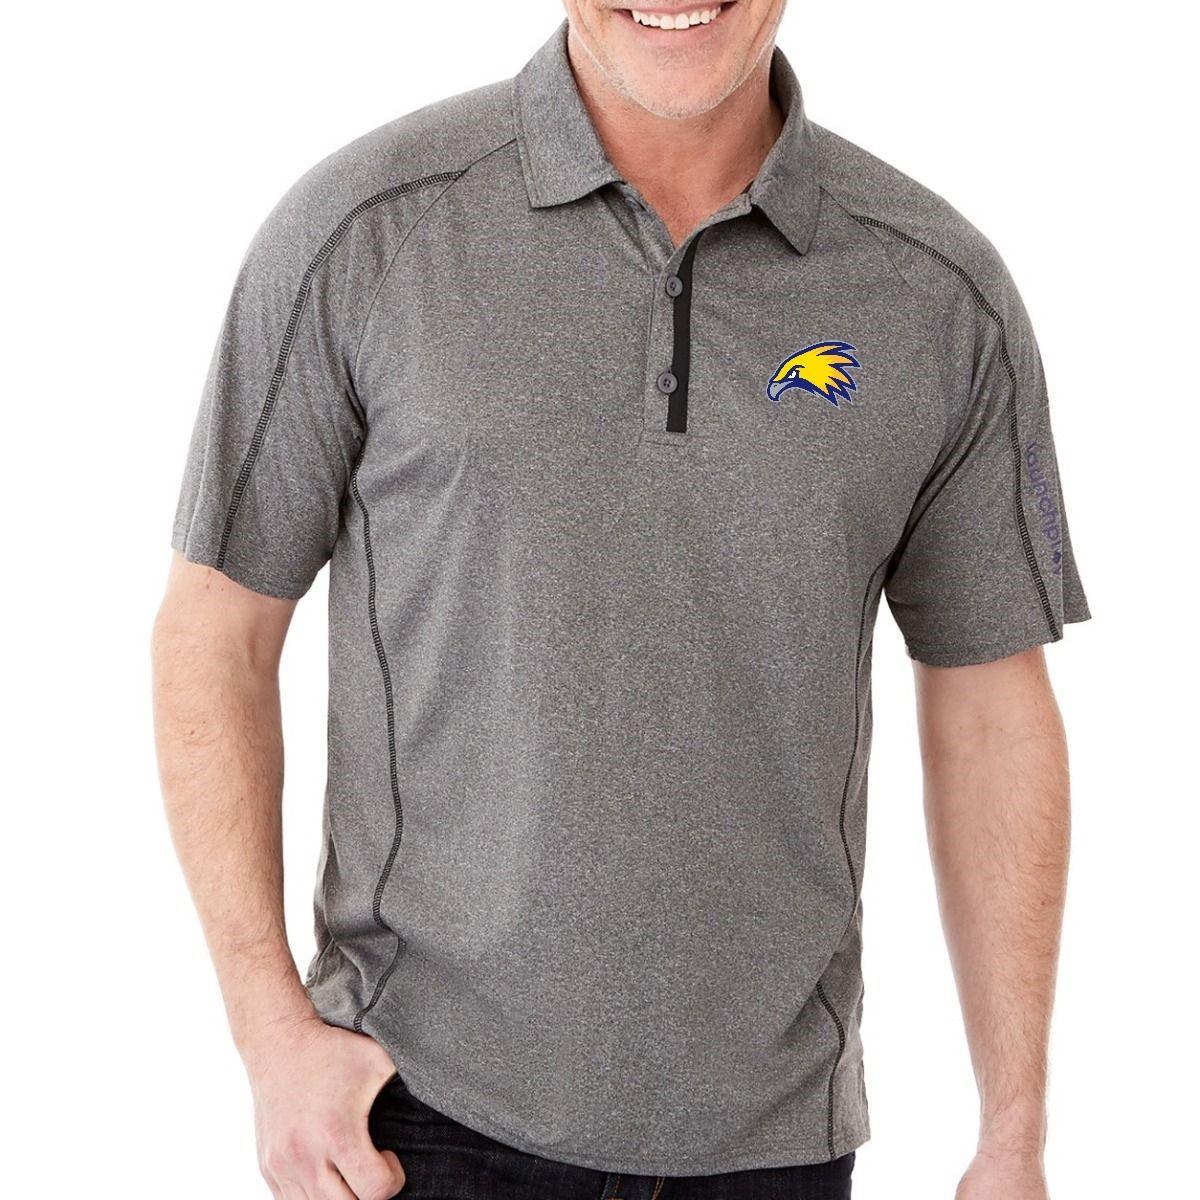 M-MACTA Short Sleeve Polo